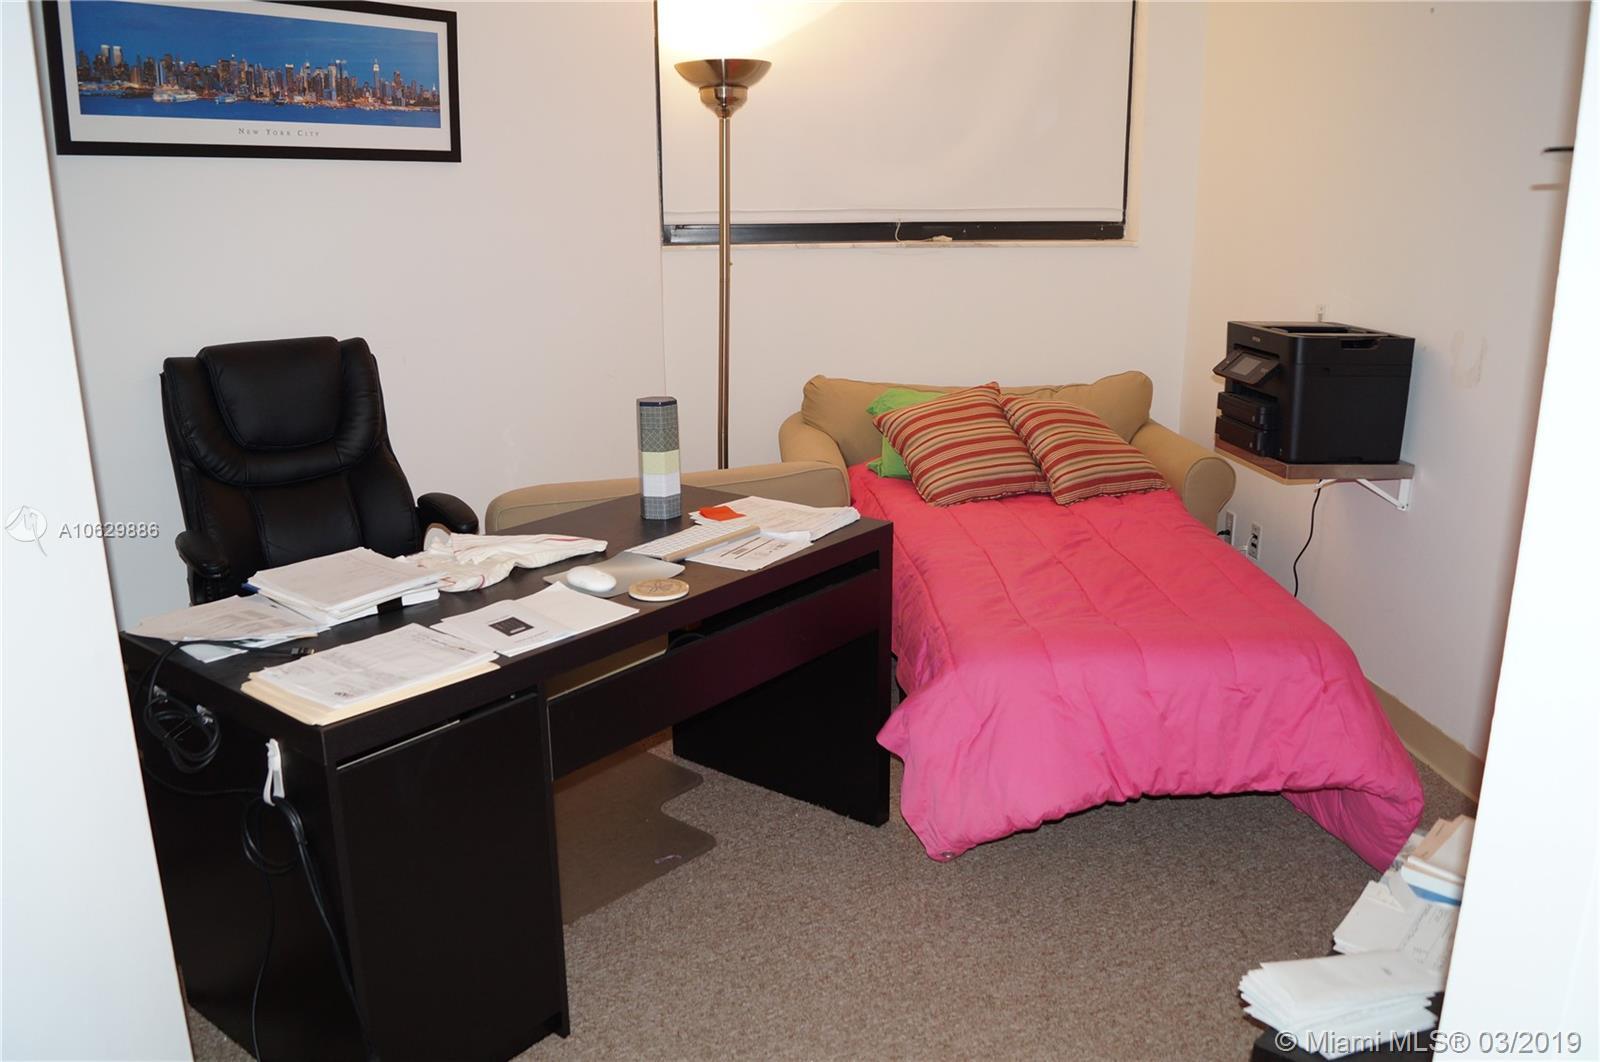 3000 Island Blvd #329, Aventura, FL 33160 - Aventura, FL real estate listing